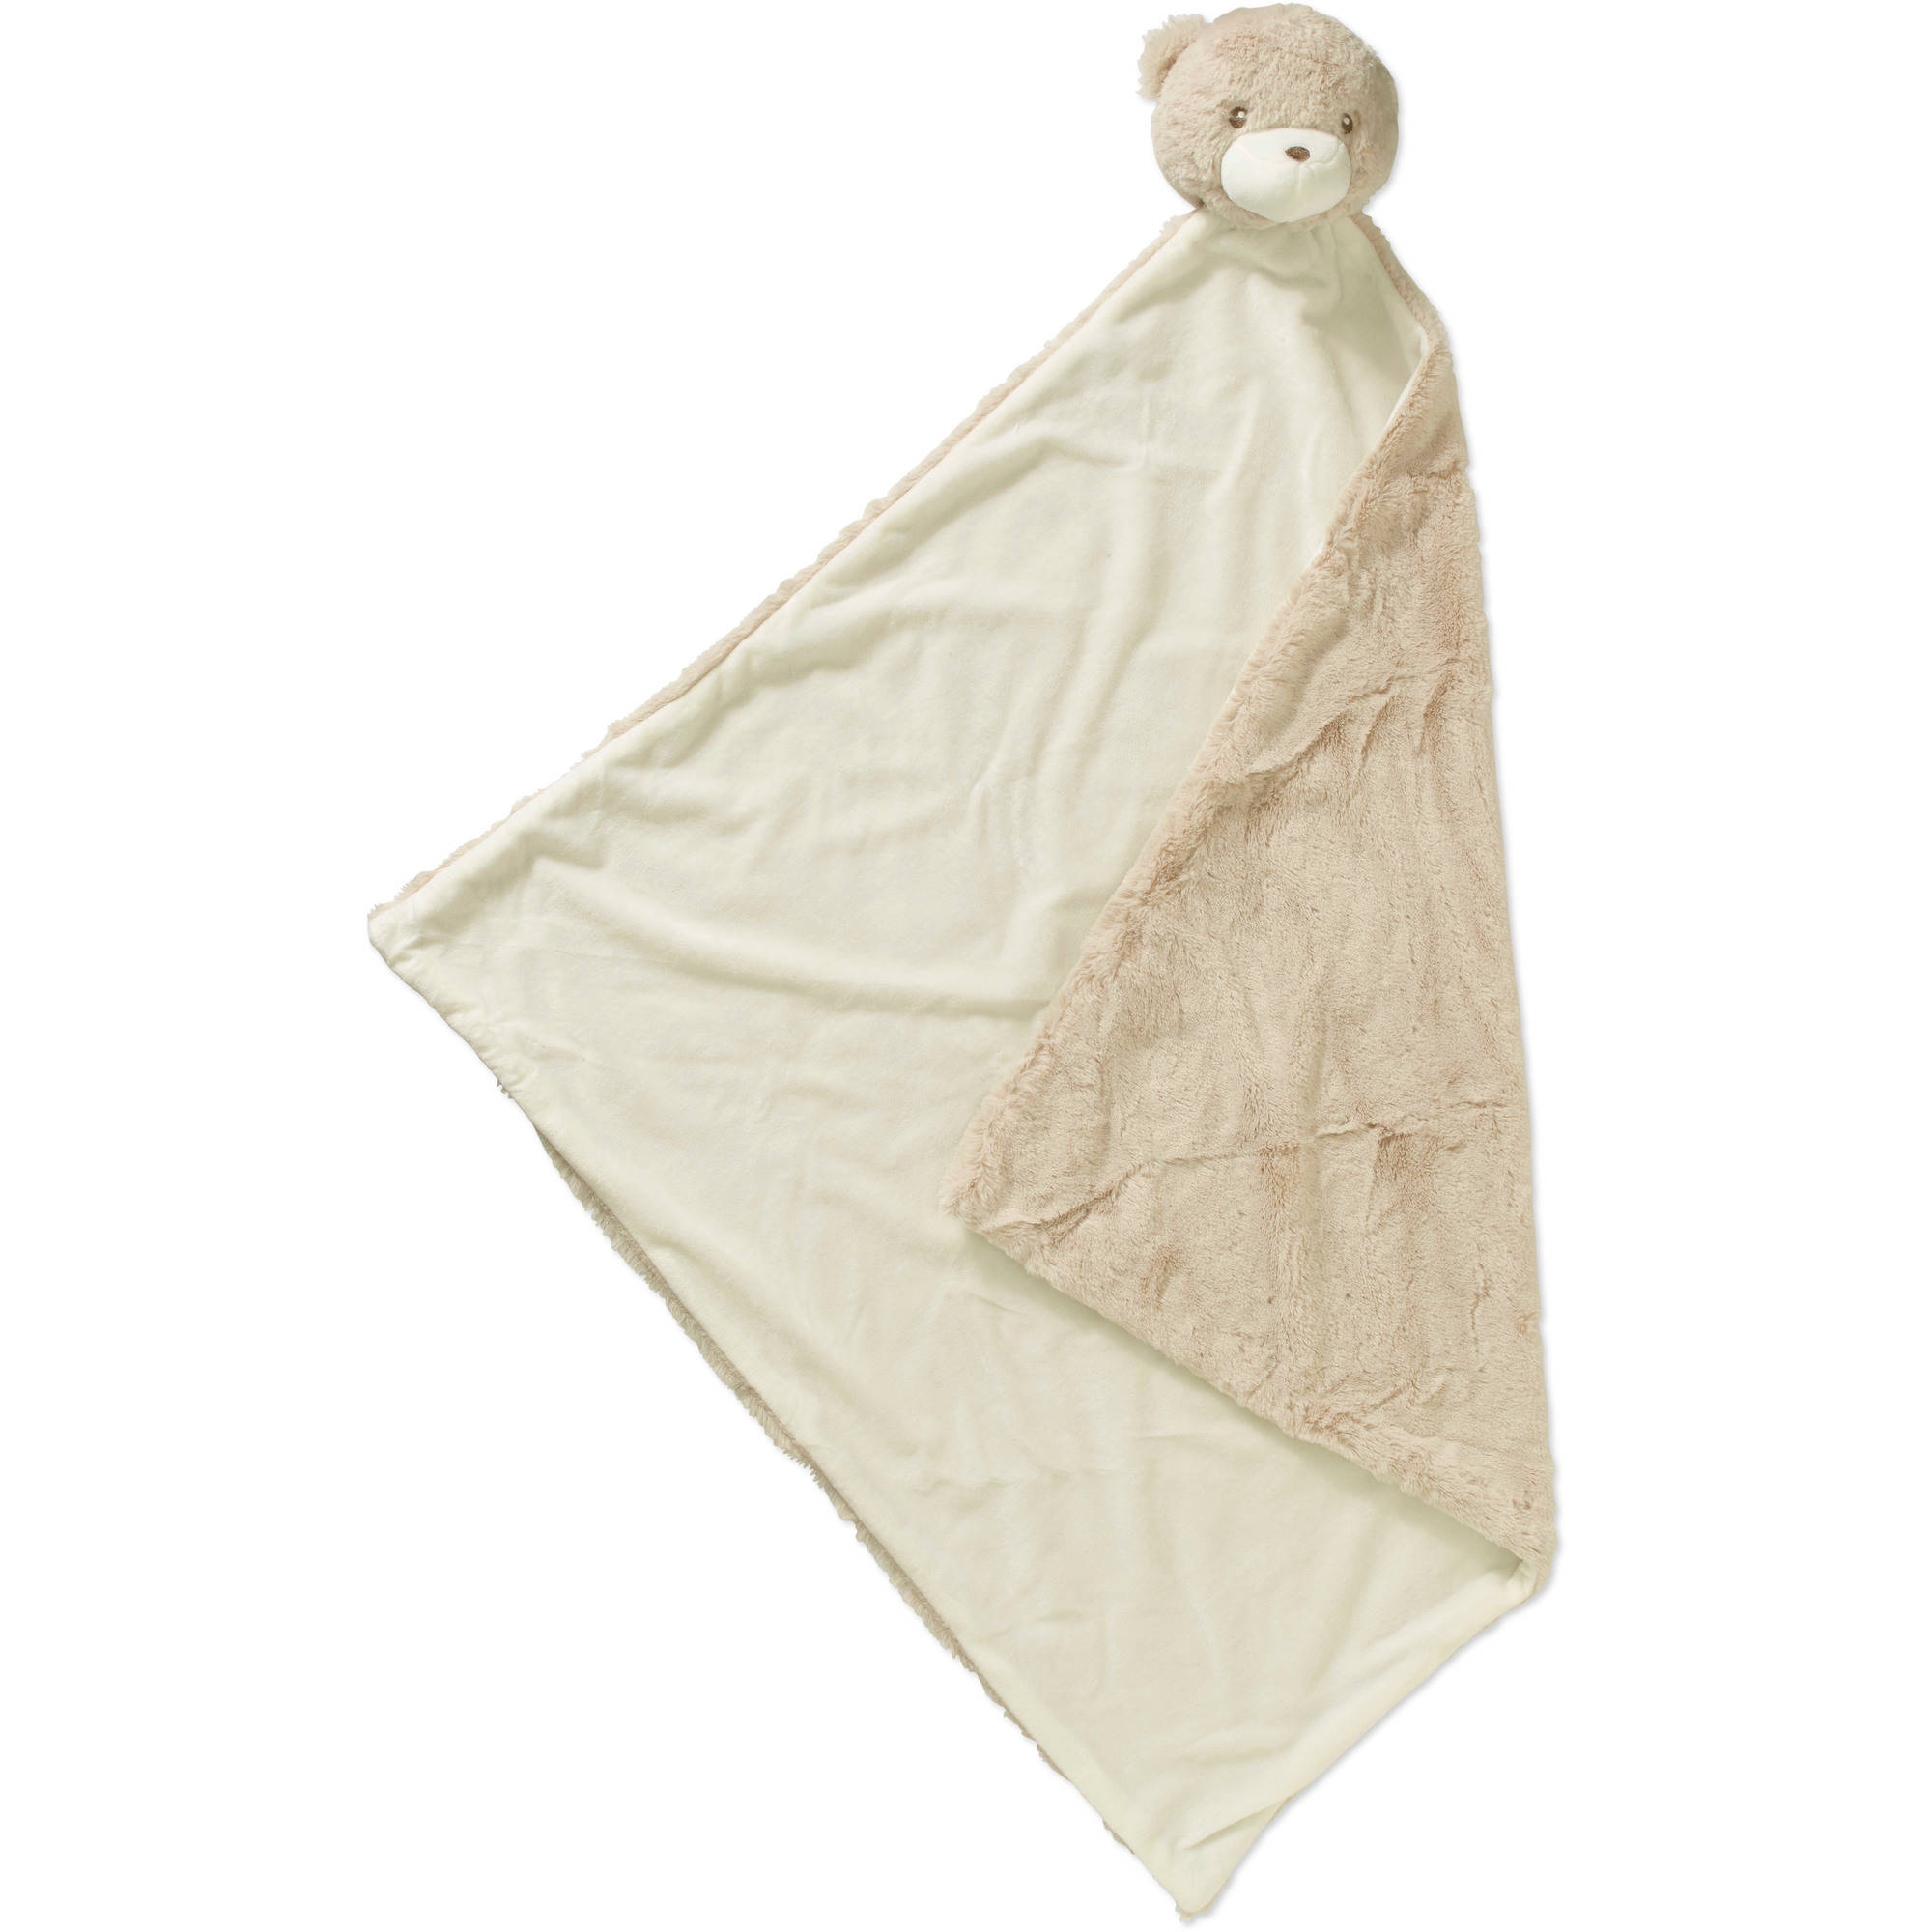 Quiltex Newborn Baby Plush Bear Security Blanket